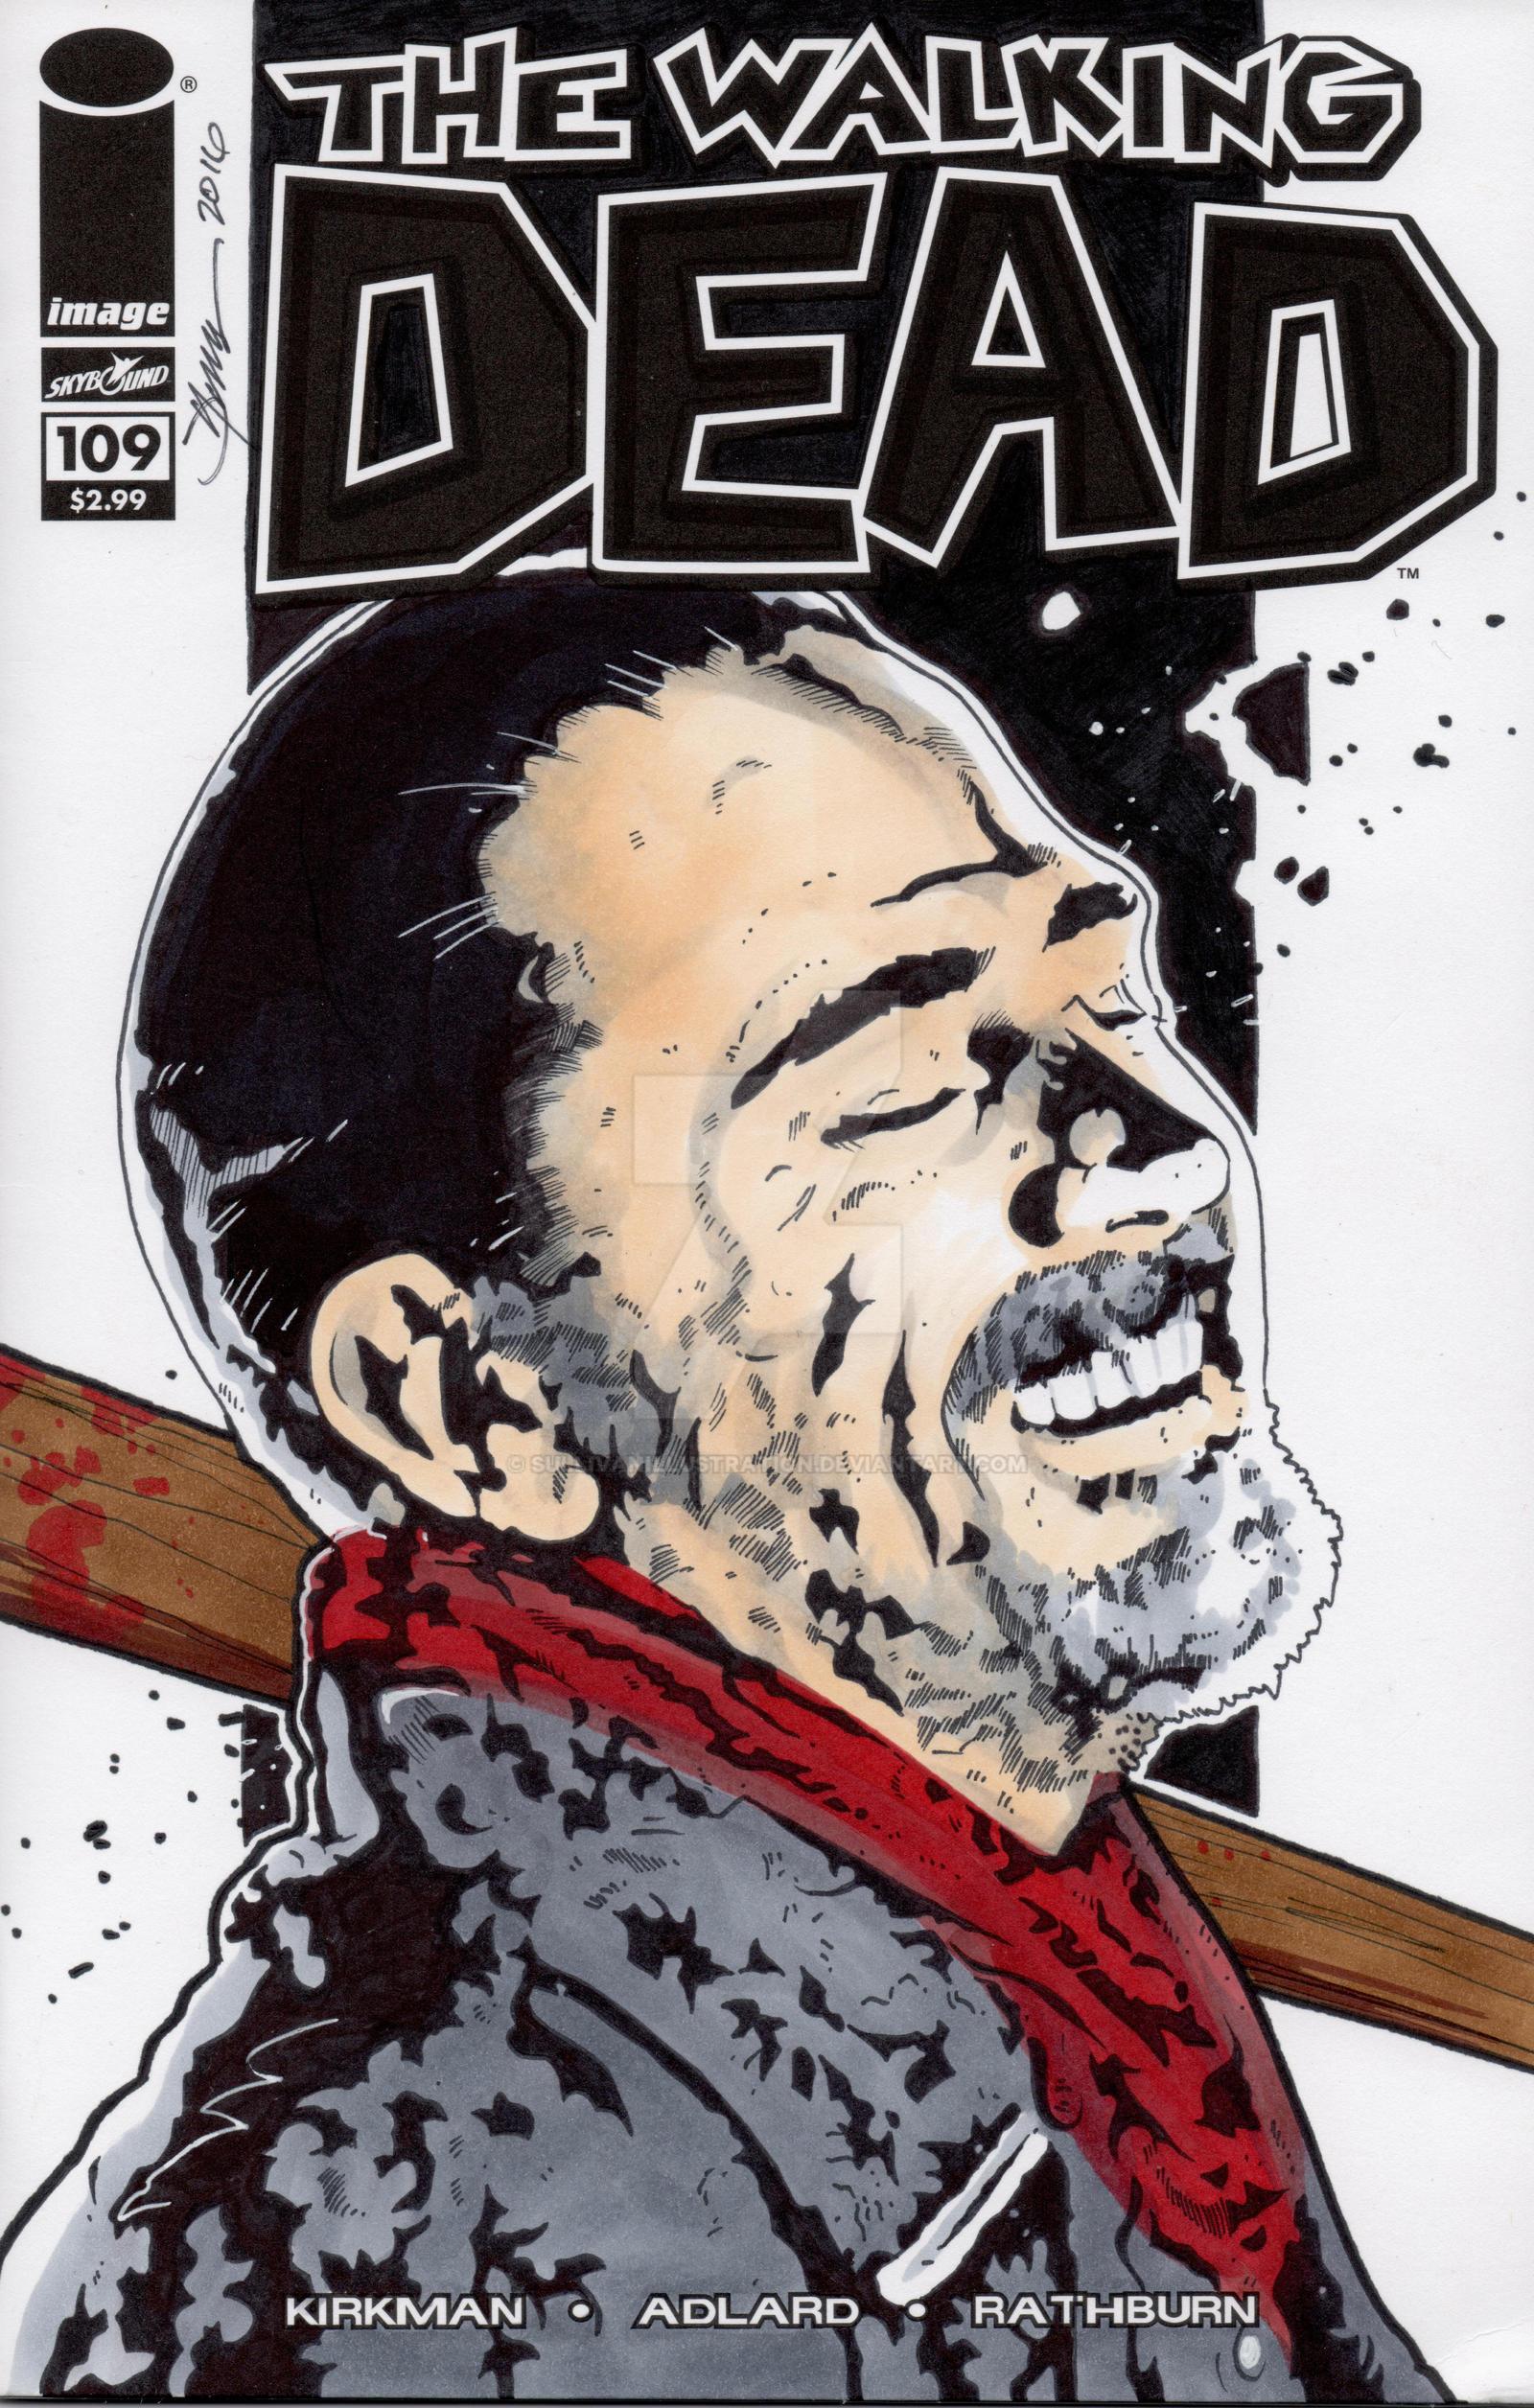 Walking Dead Negan Hand Drawn Sketch Cover by sullivanillustration